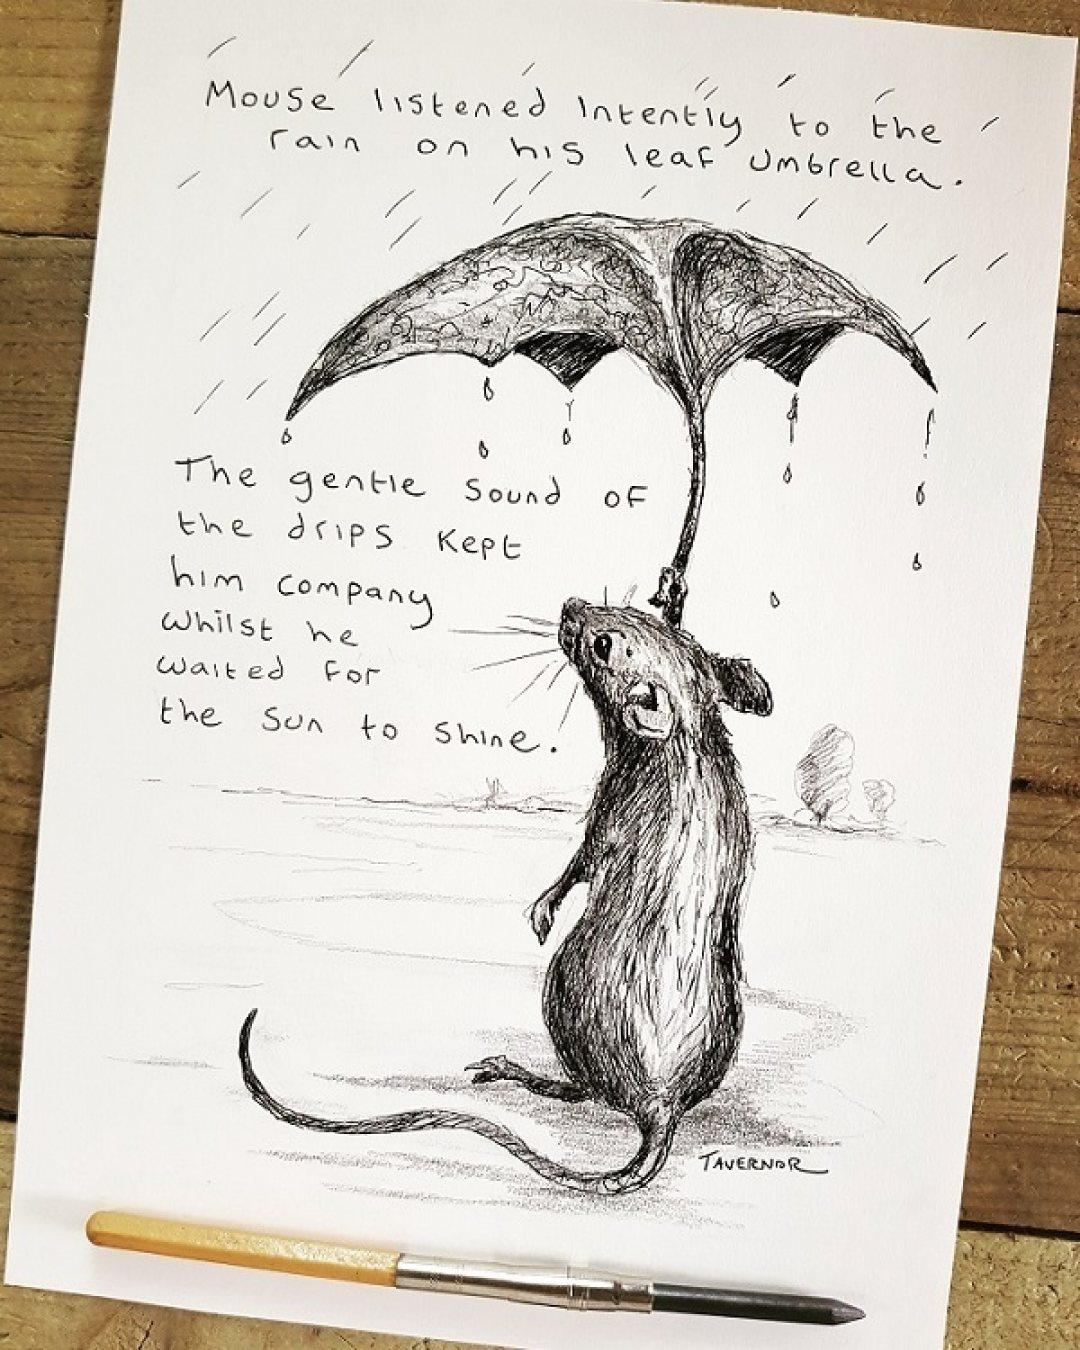 Raindrops Paul Tavernor